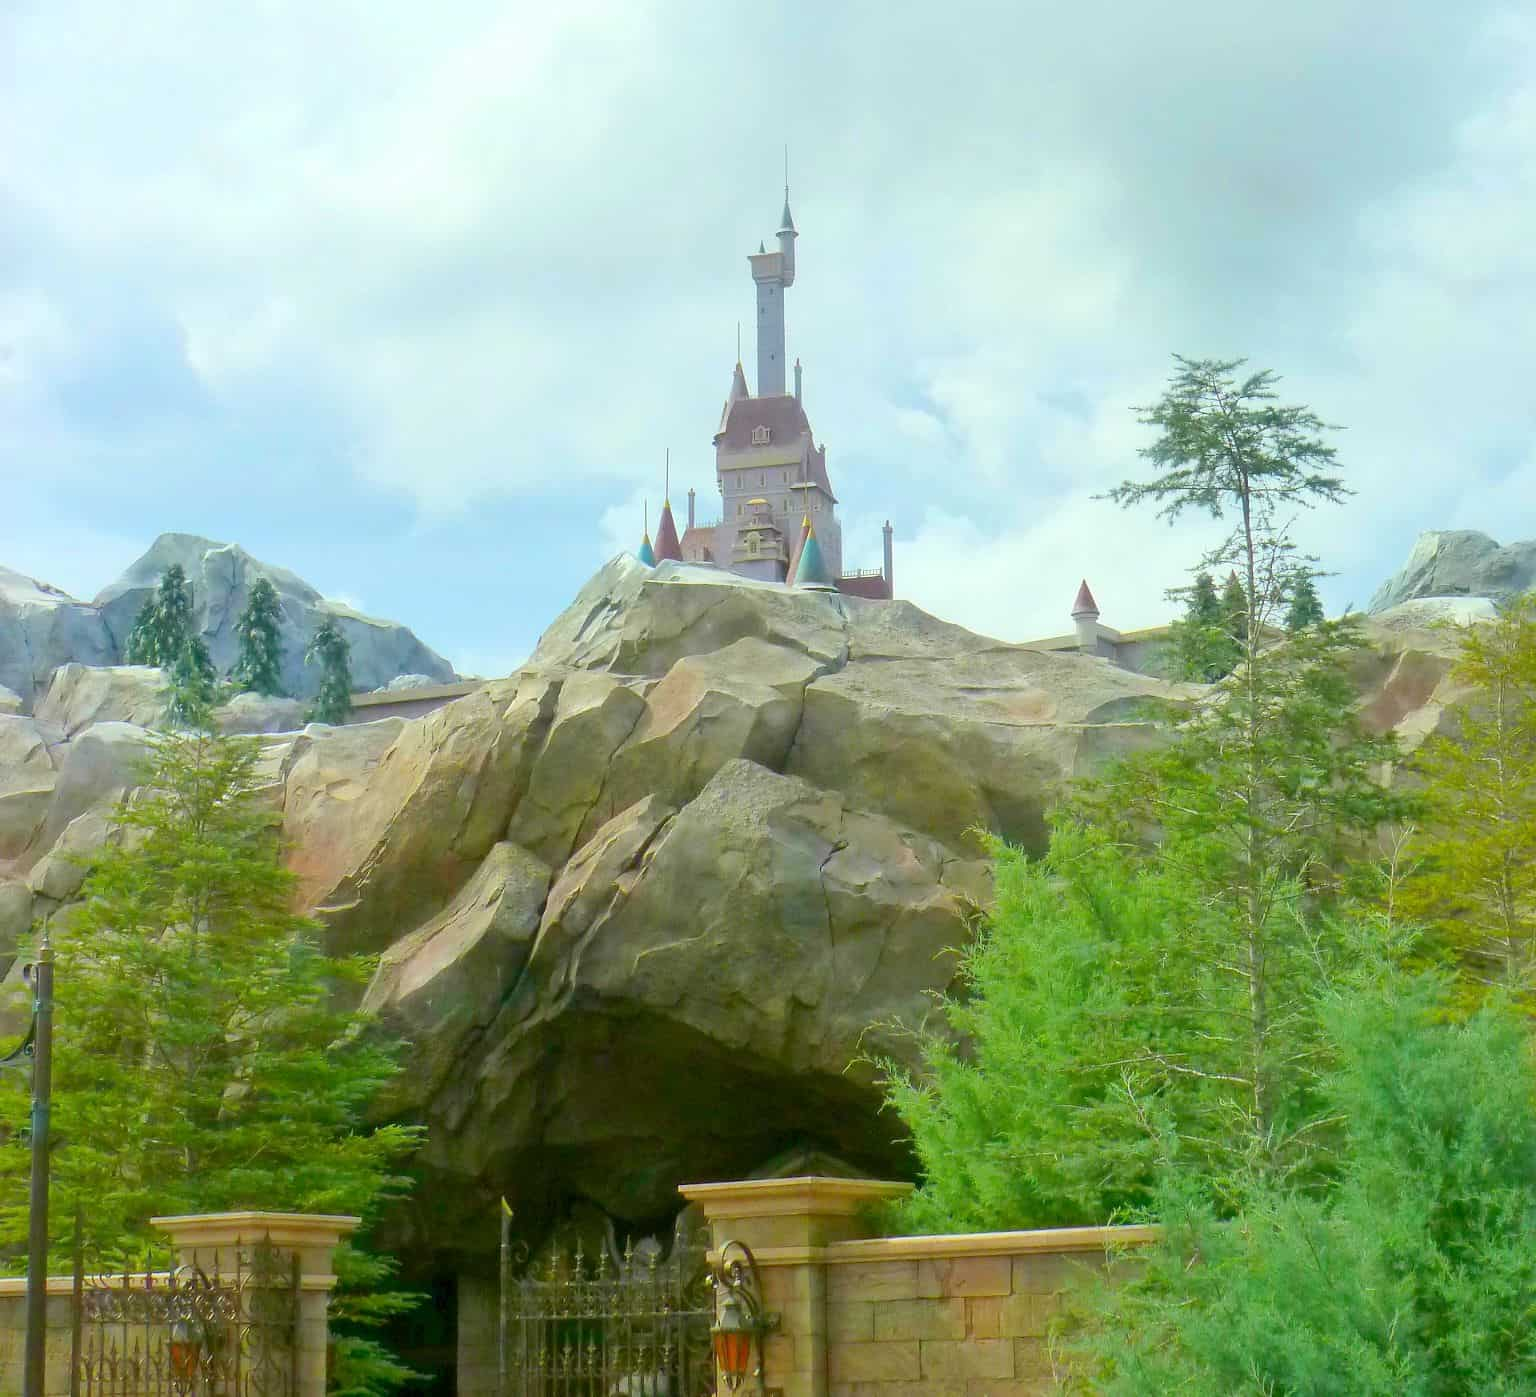 The Beasts Castle At Magic Kingdom, Disney World, With Teens And Tweens www.extraordinarychaos.com